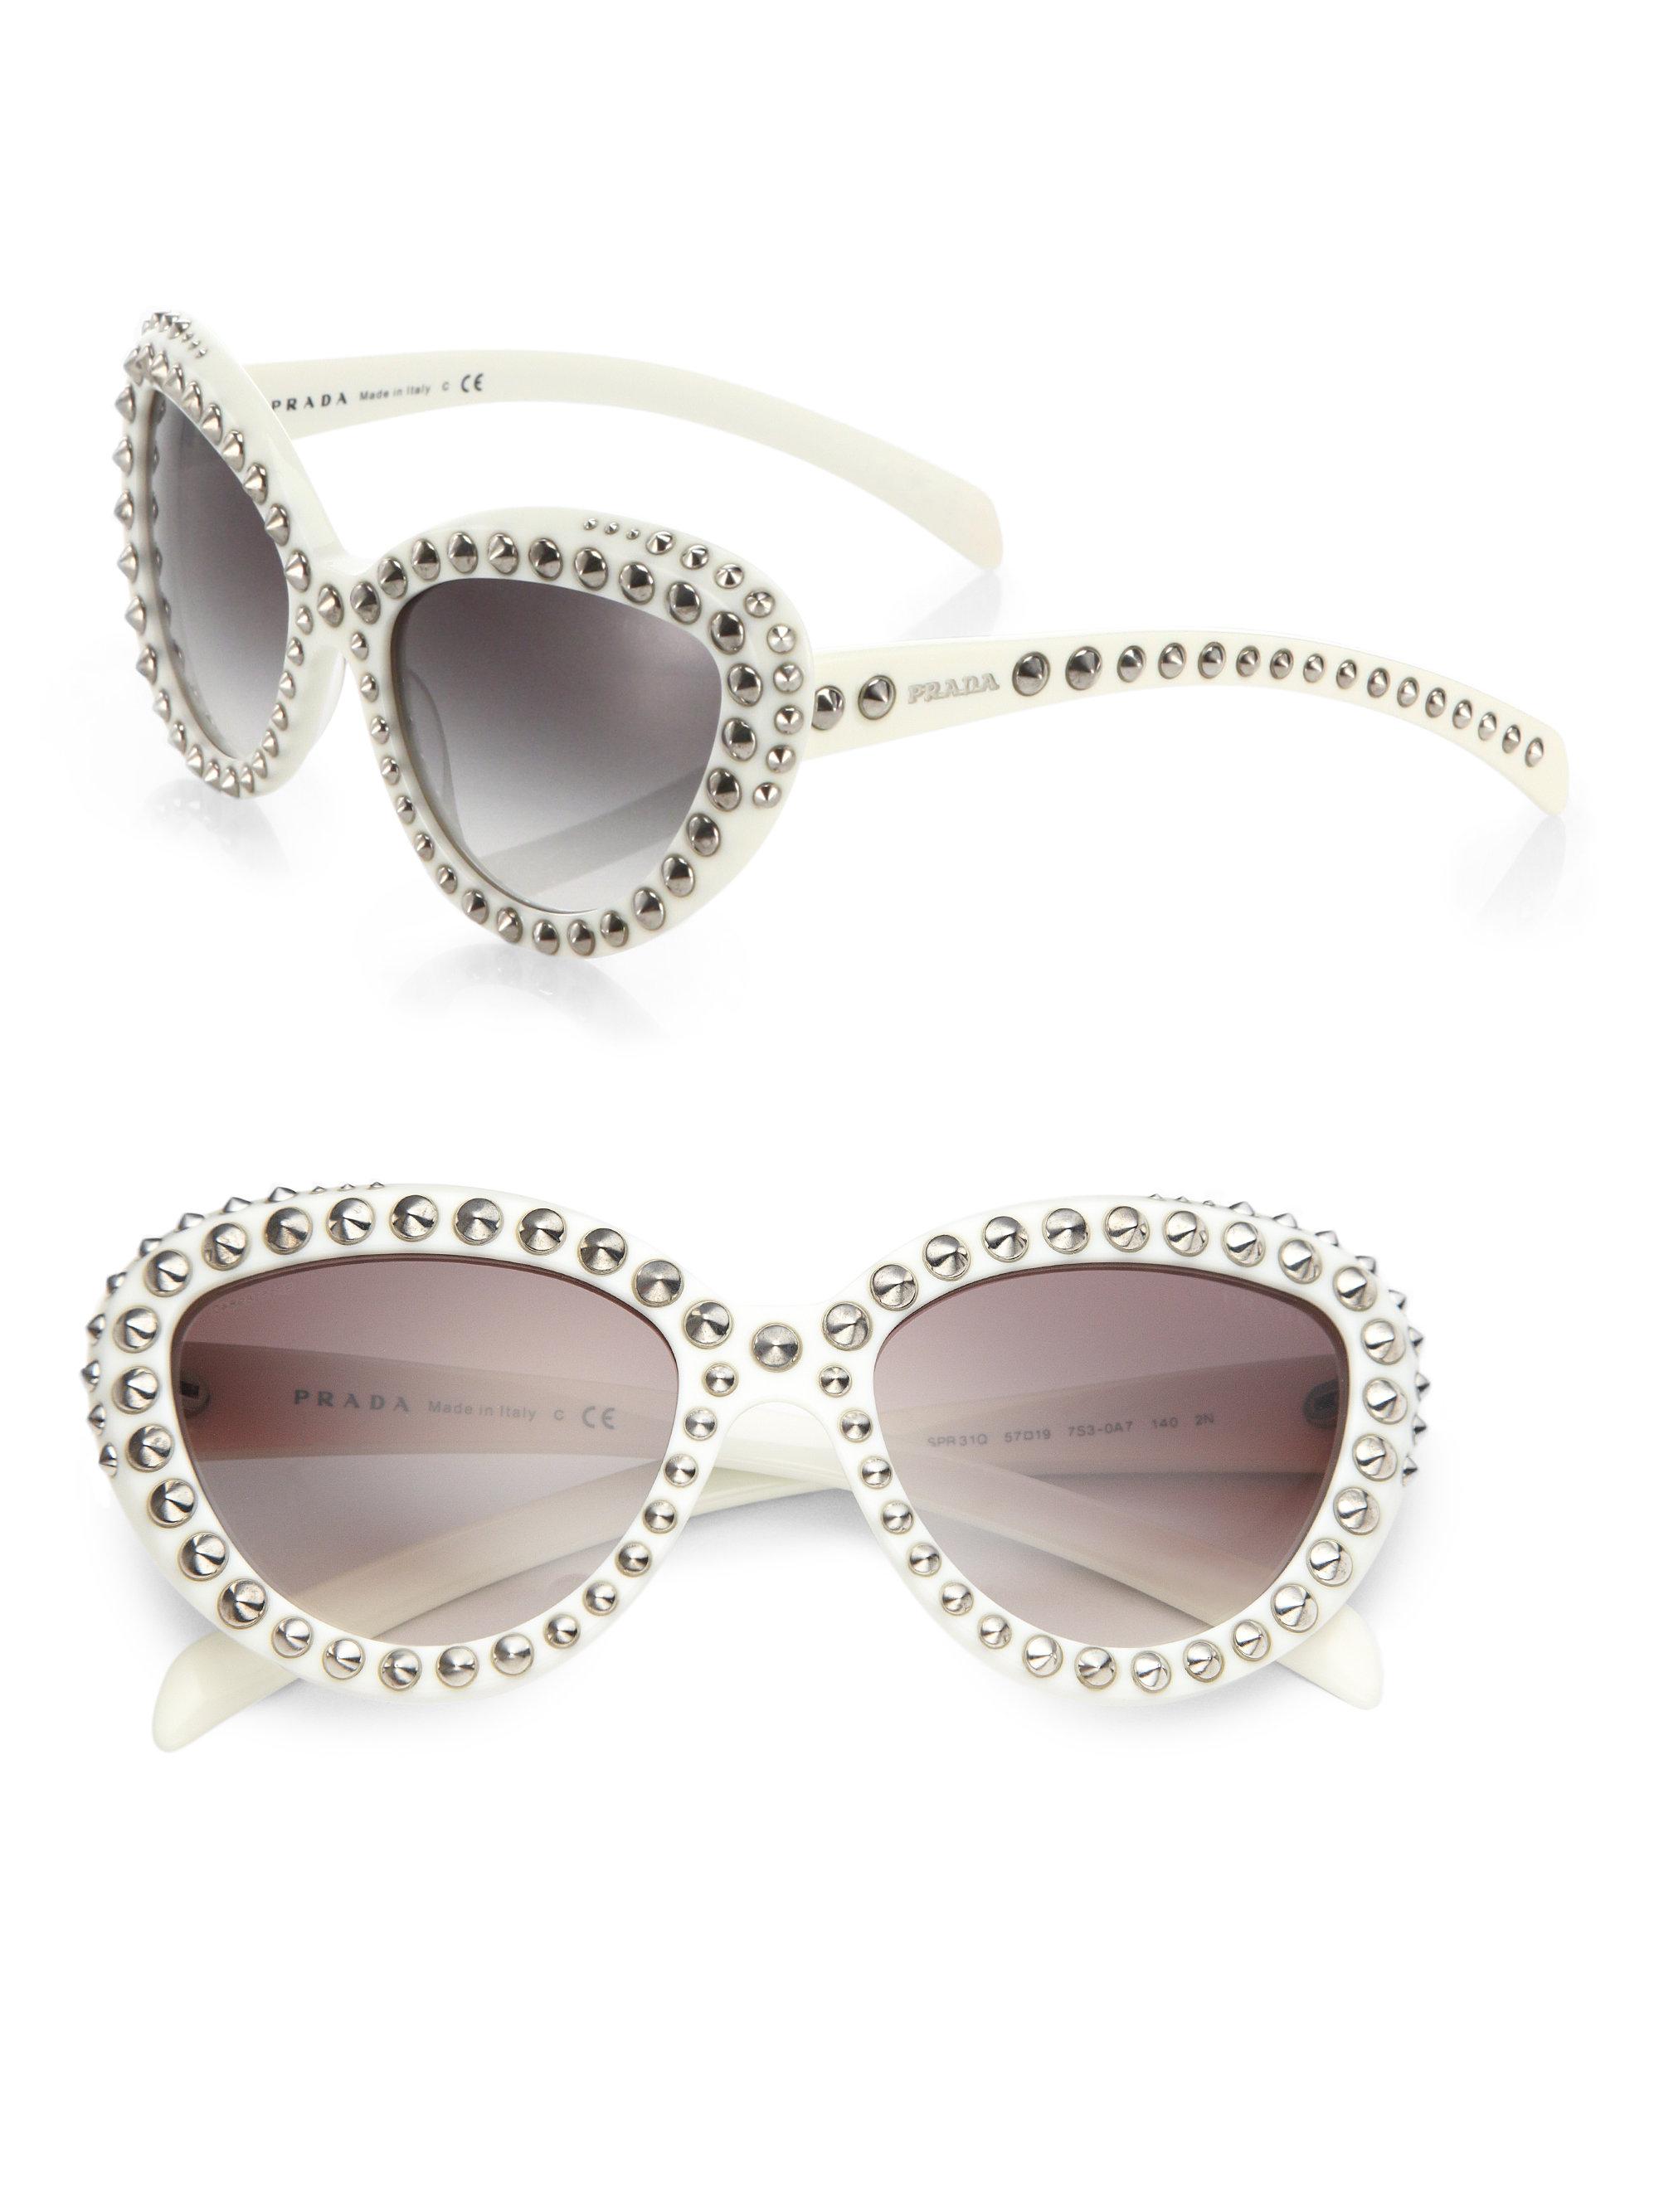 Prada 56mm Studded Round-frame Sunglasses in White Lyst